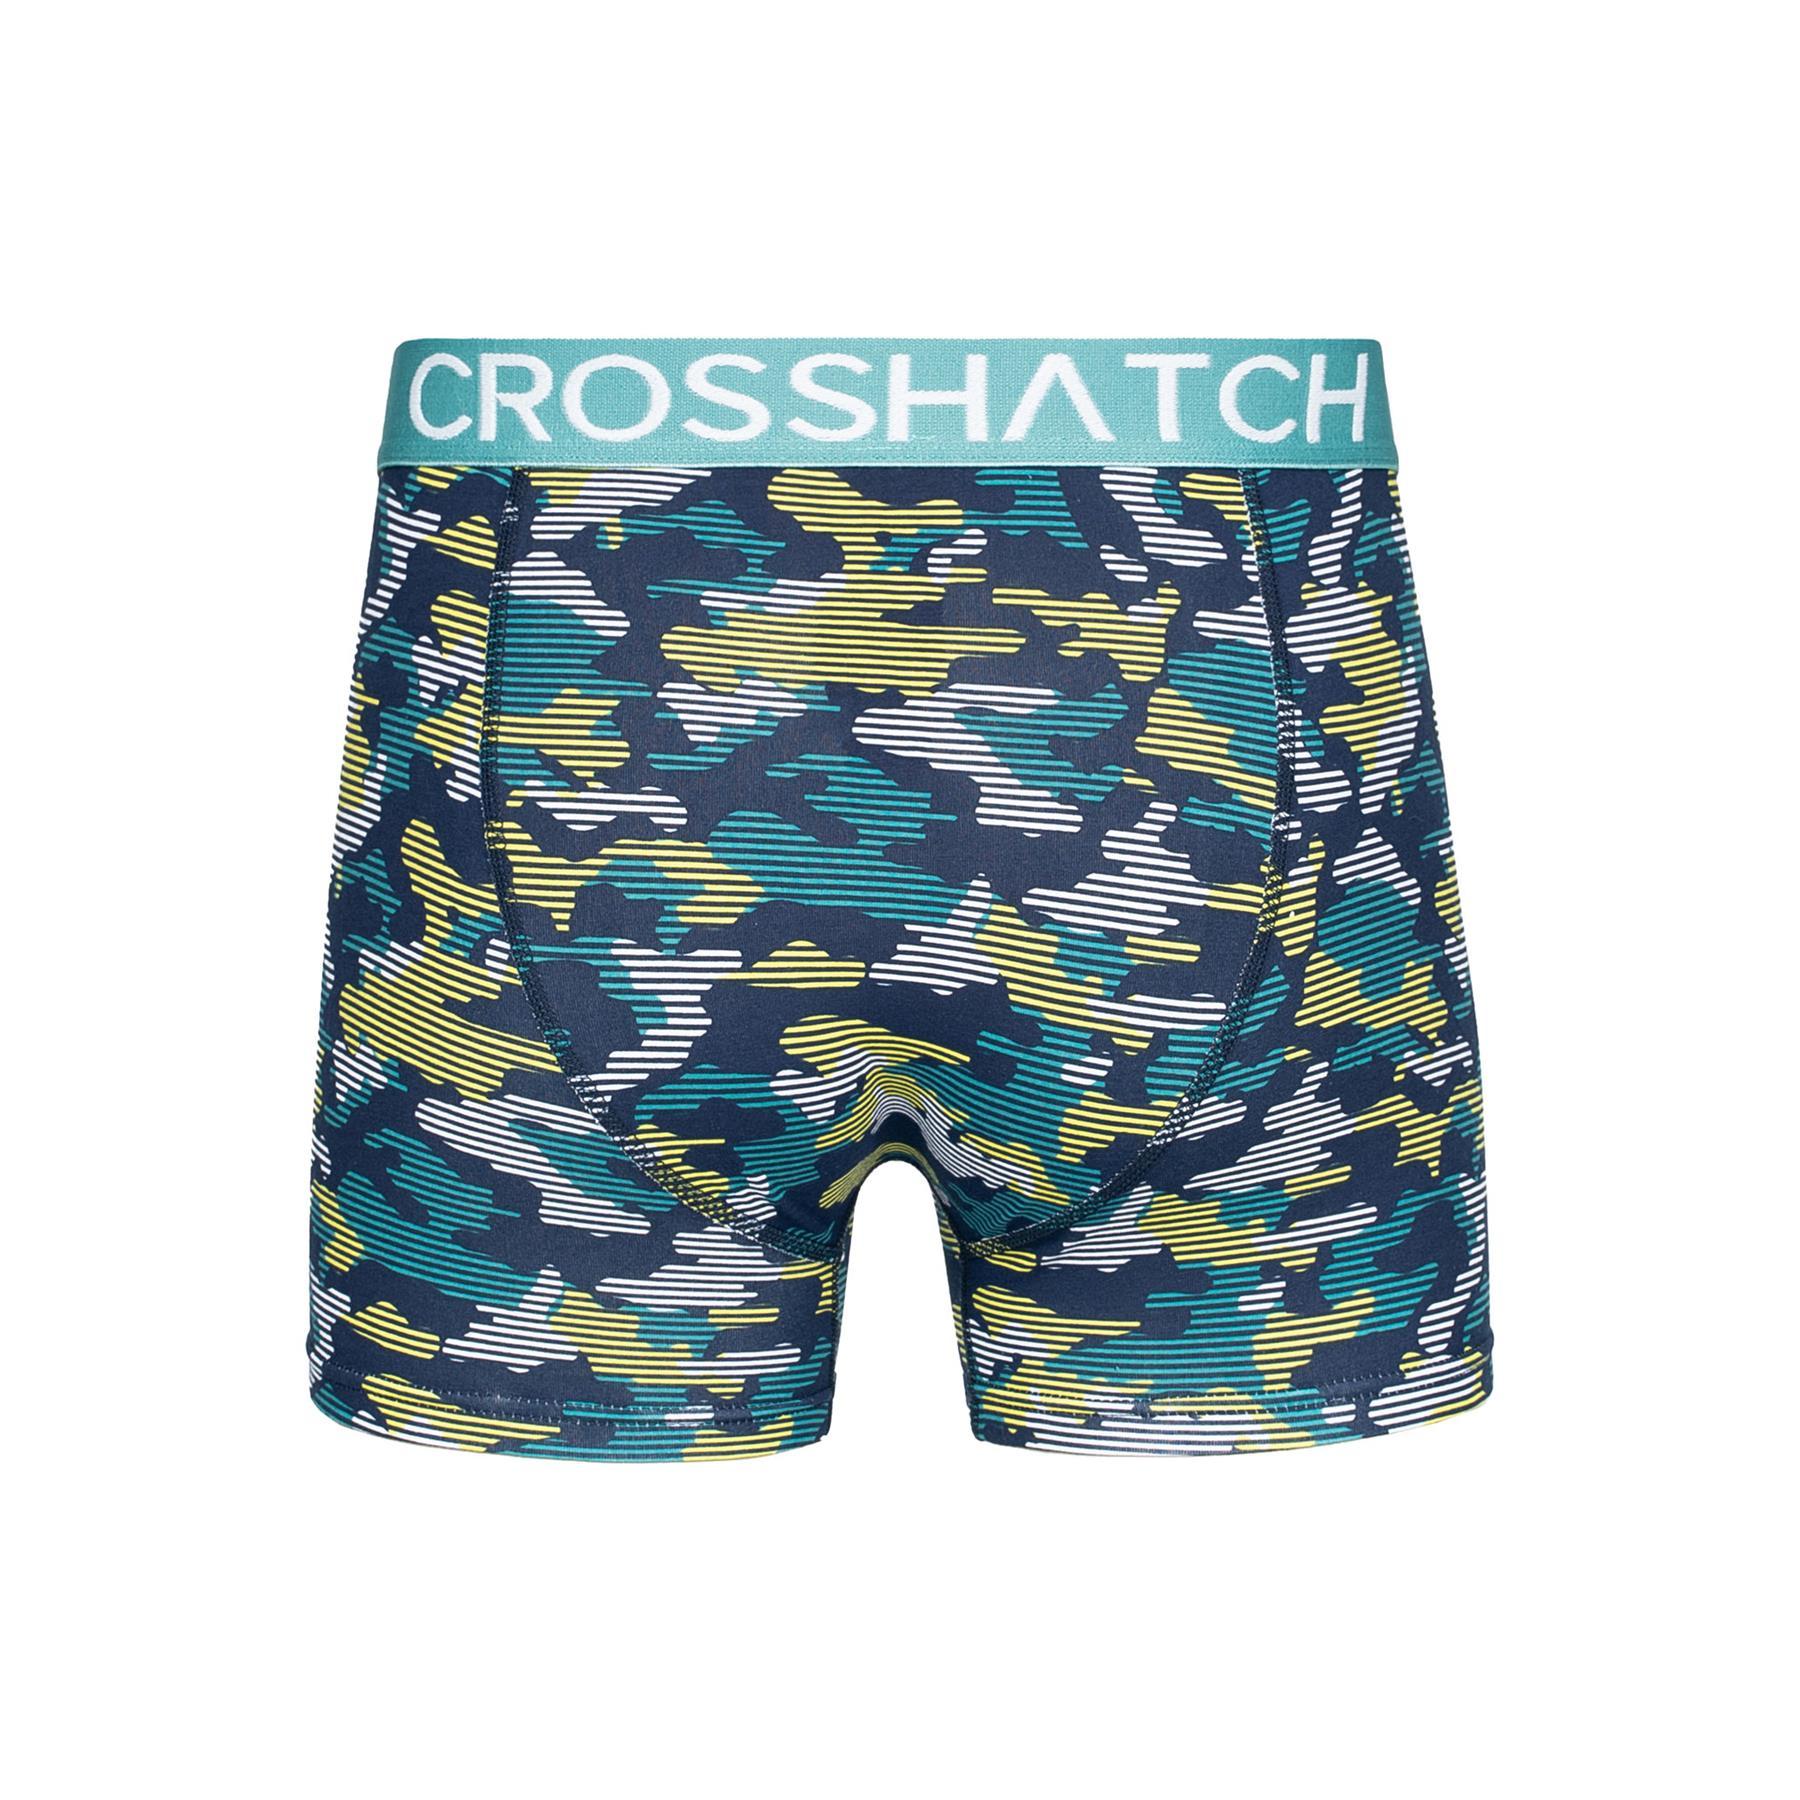 thumbnail 66 - Mens Crosshatch Boxers 3 Pack Shorts Underwear Trunks Underpants Multipack Sets